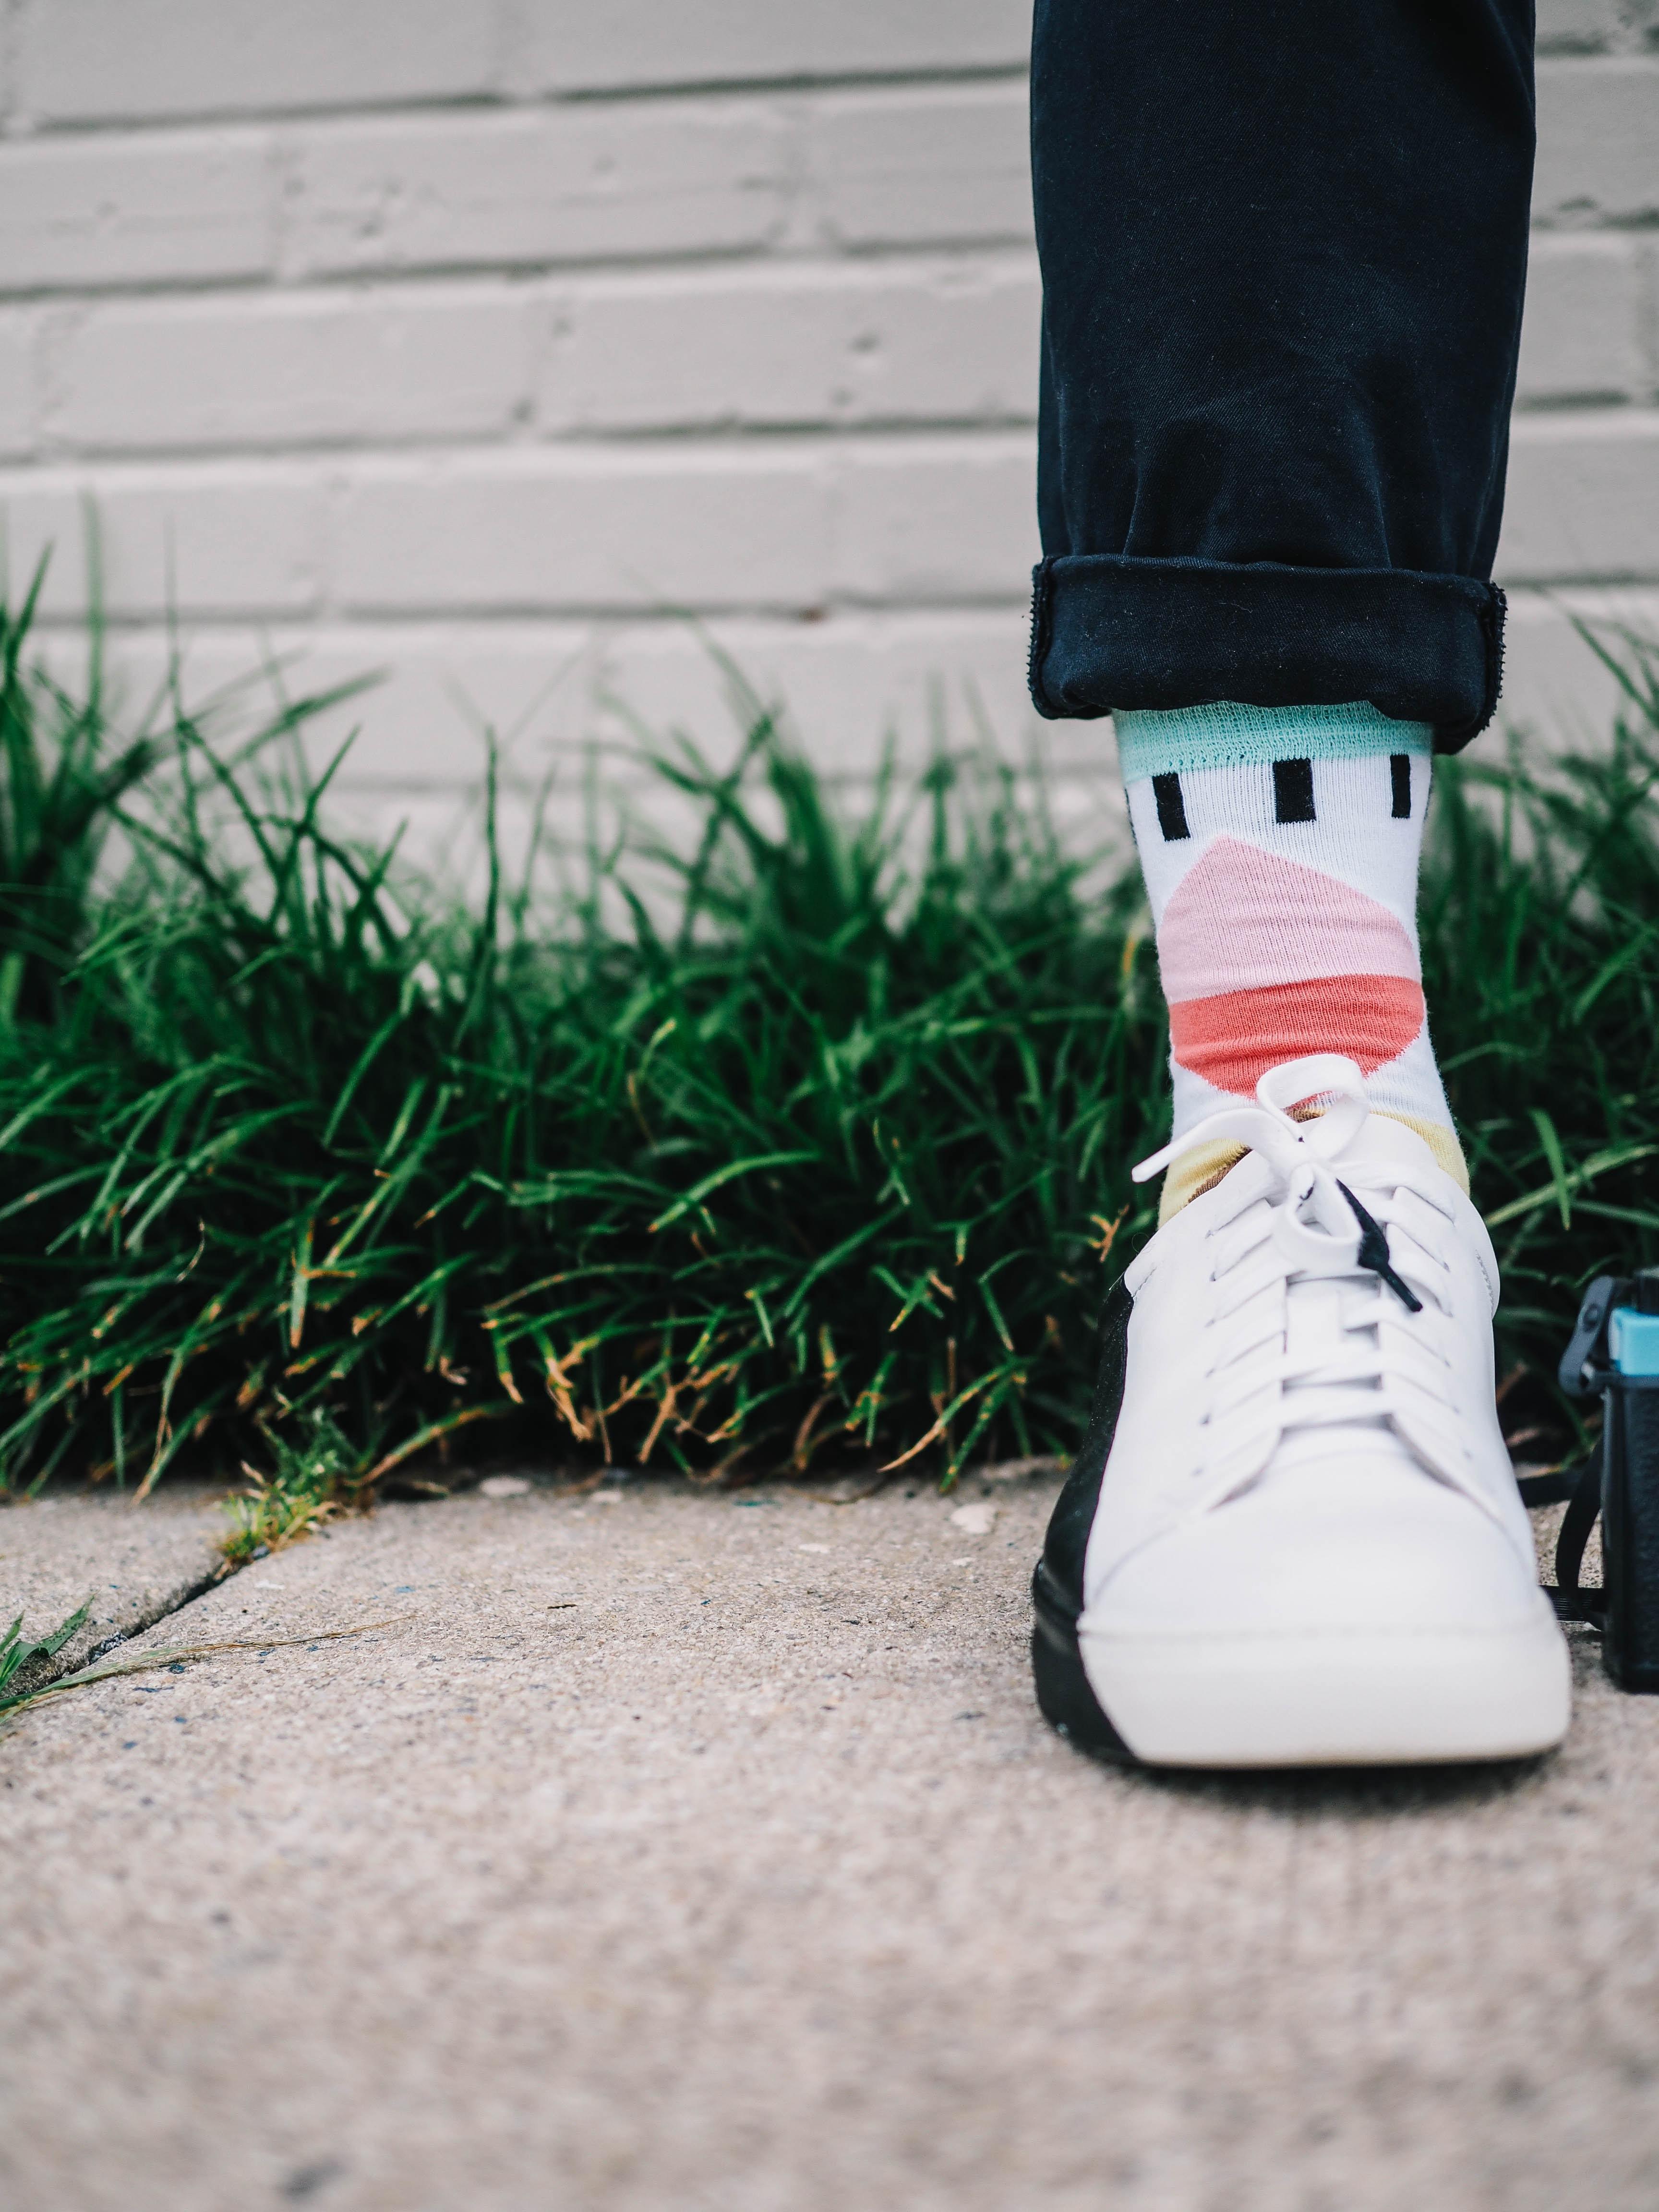 Festive Socks Bring Holiday Cheer All Year